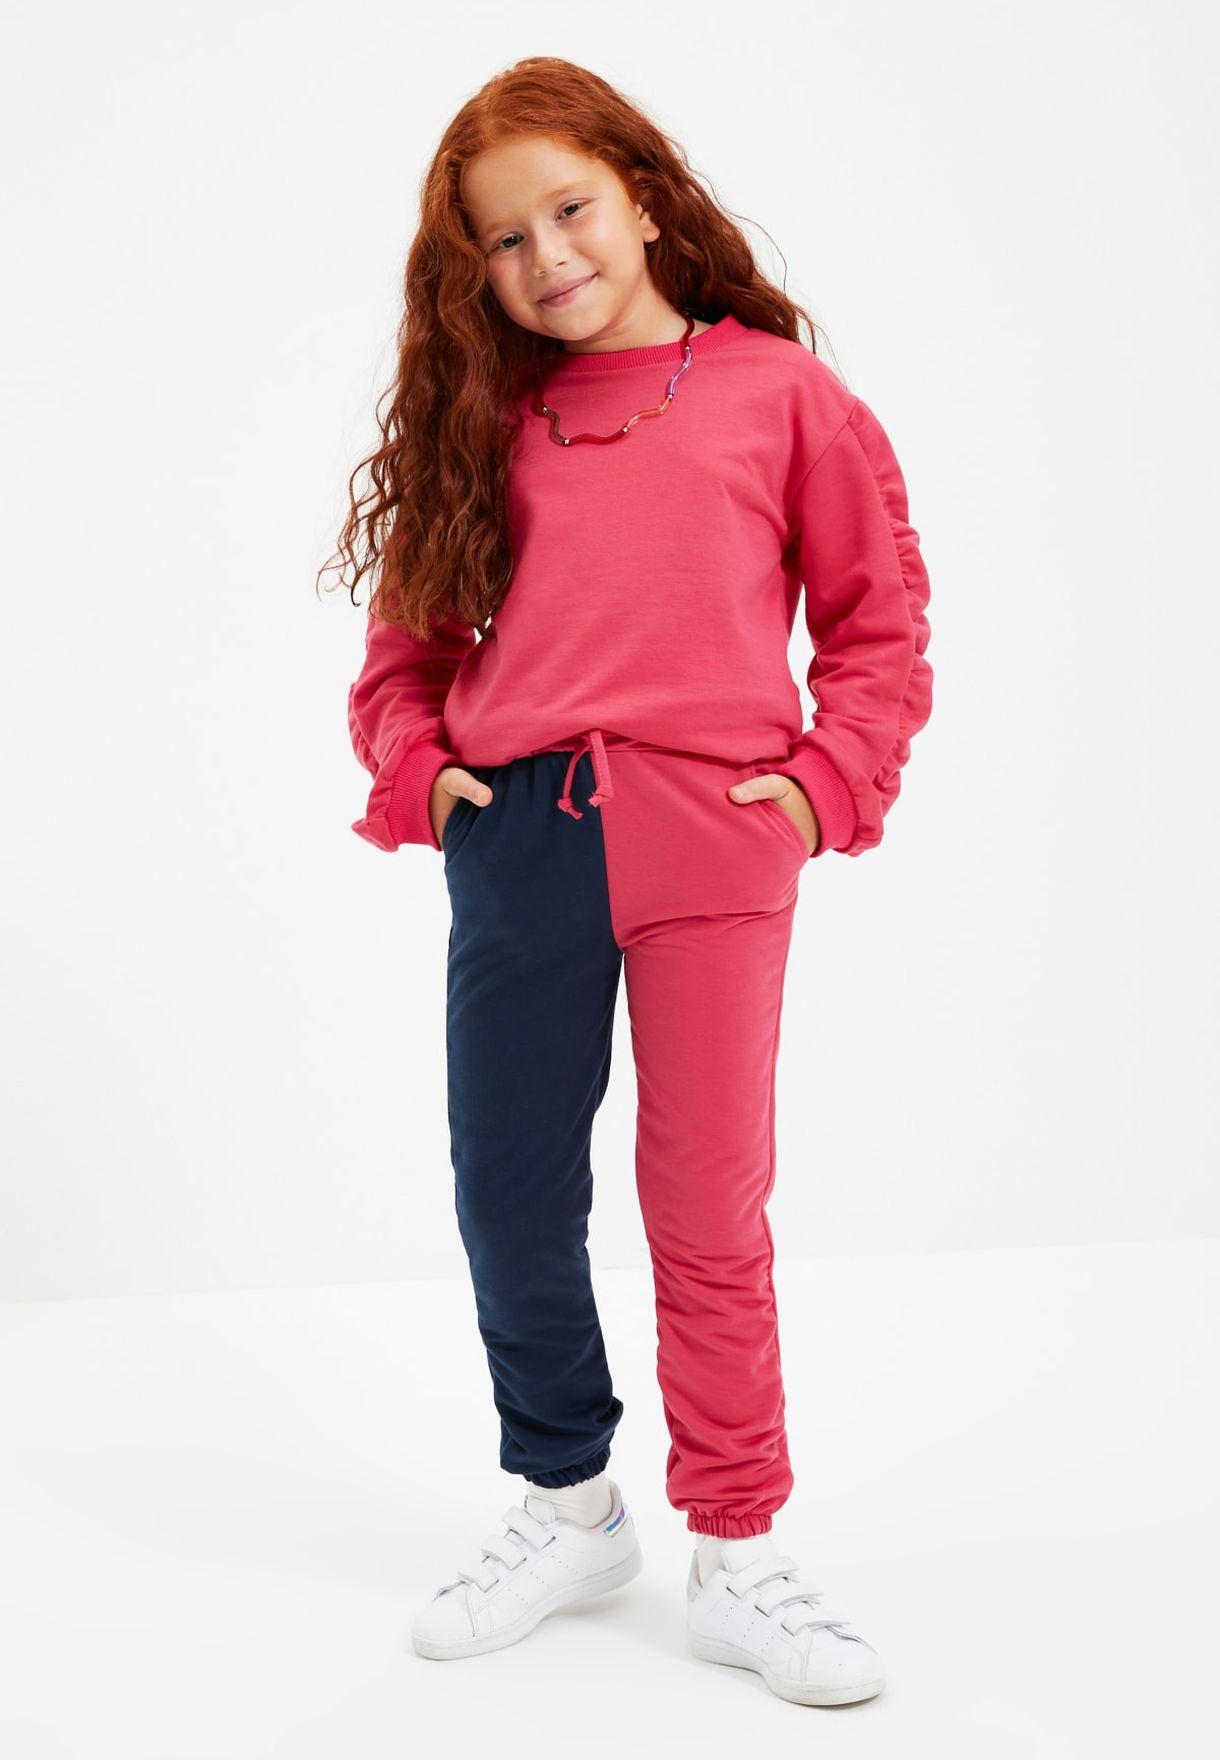 Kids Color Block Sweatpants